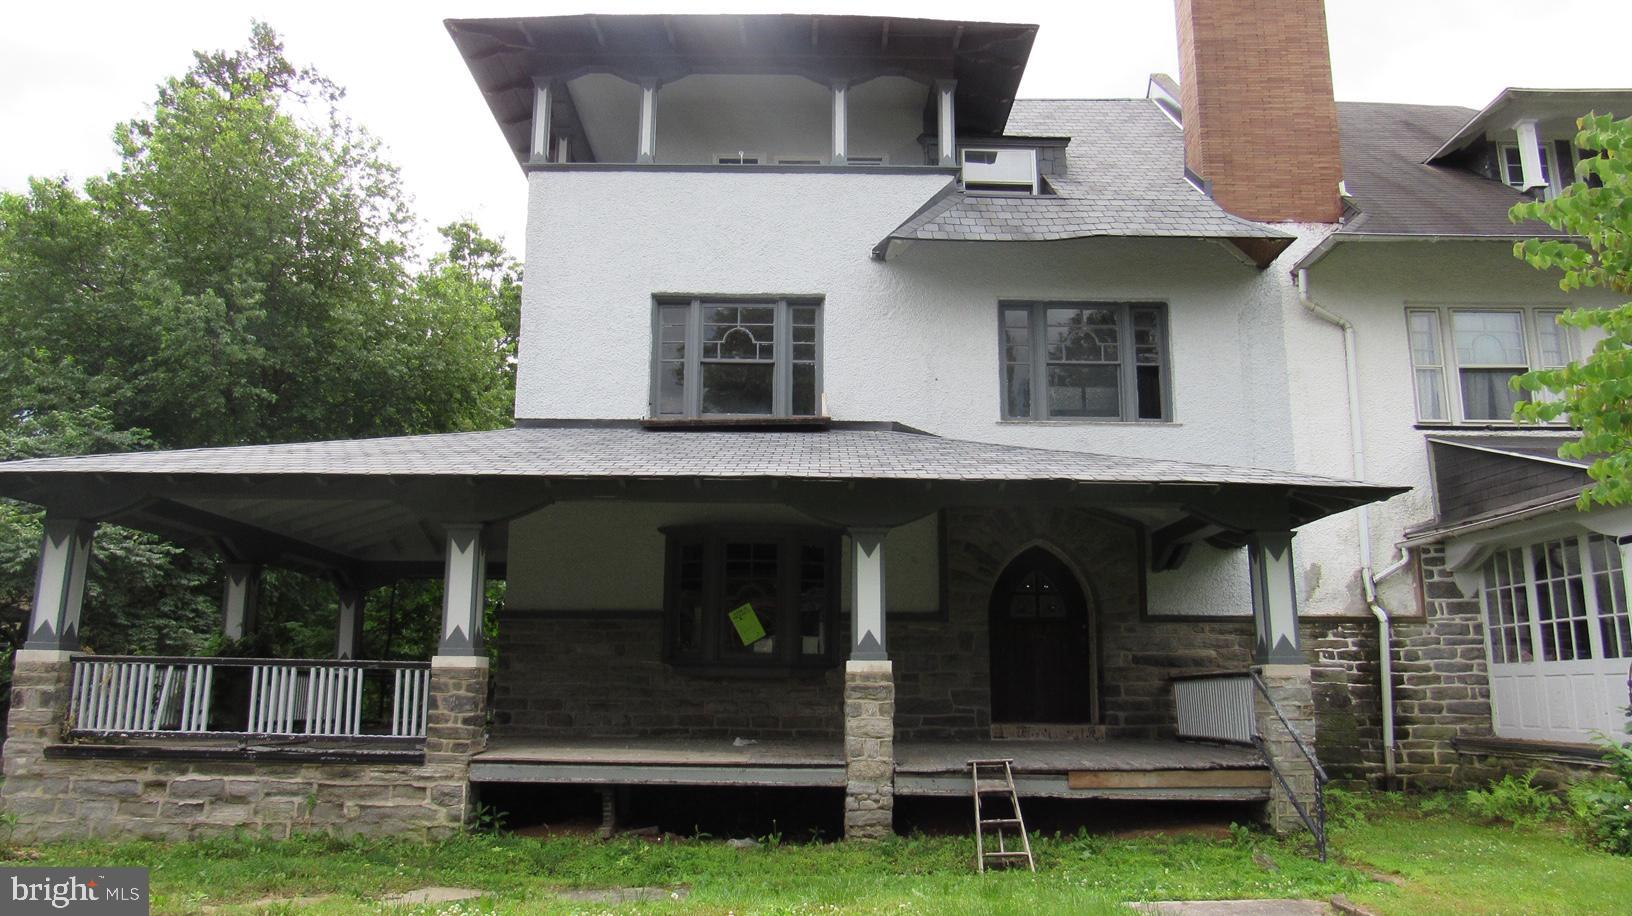 6338 DREXEL ROAD, PHILADELPHIA, PA 19151